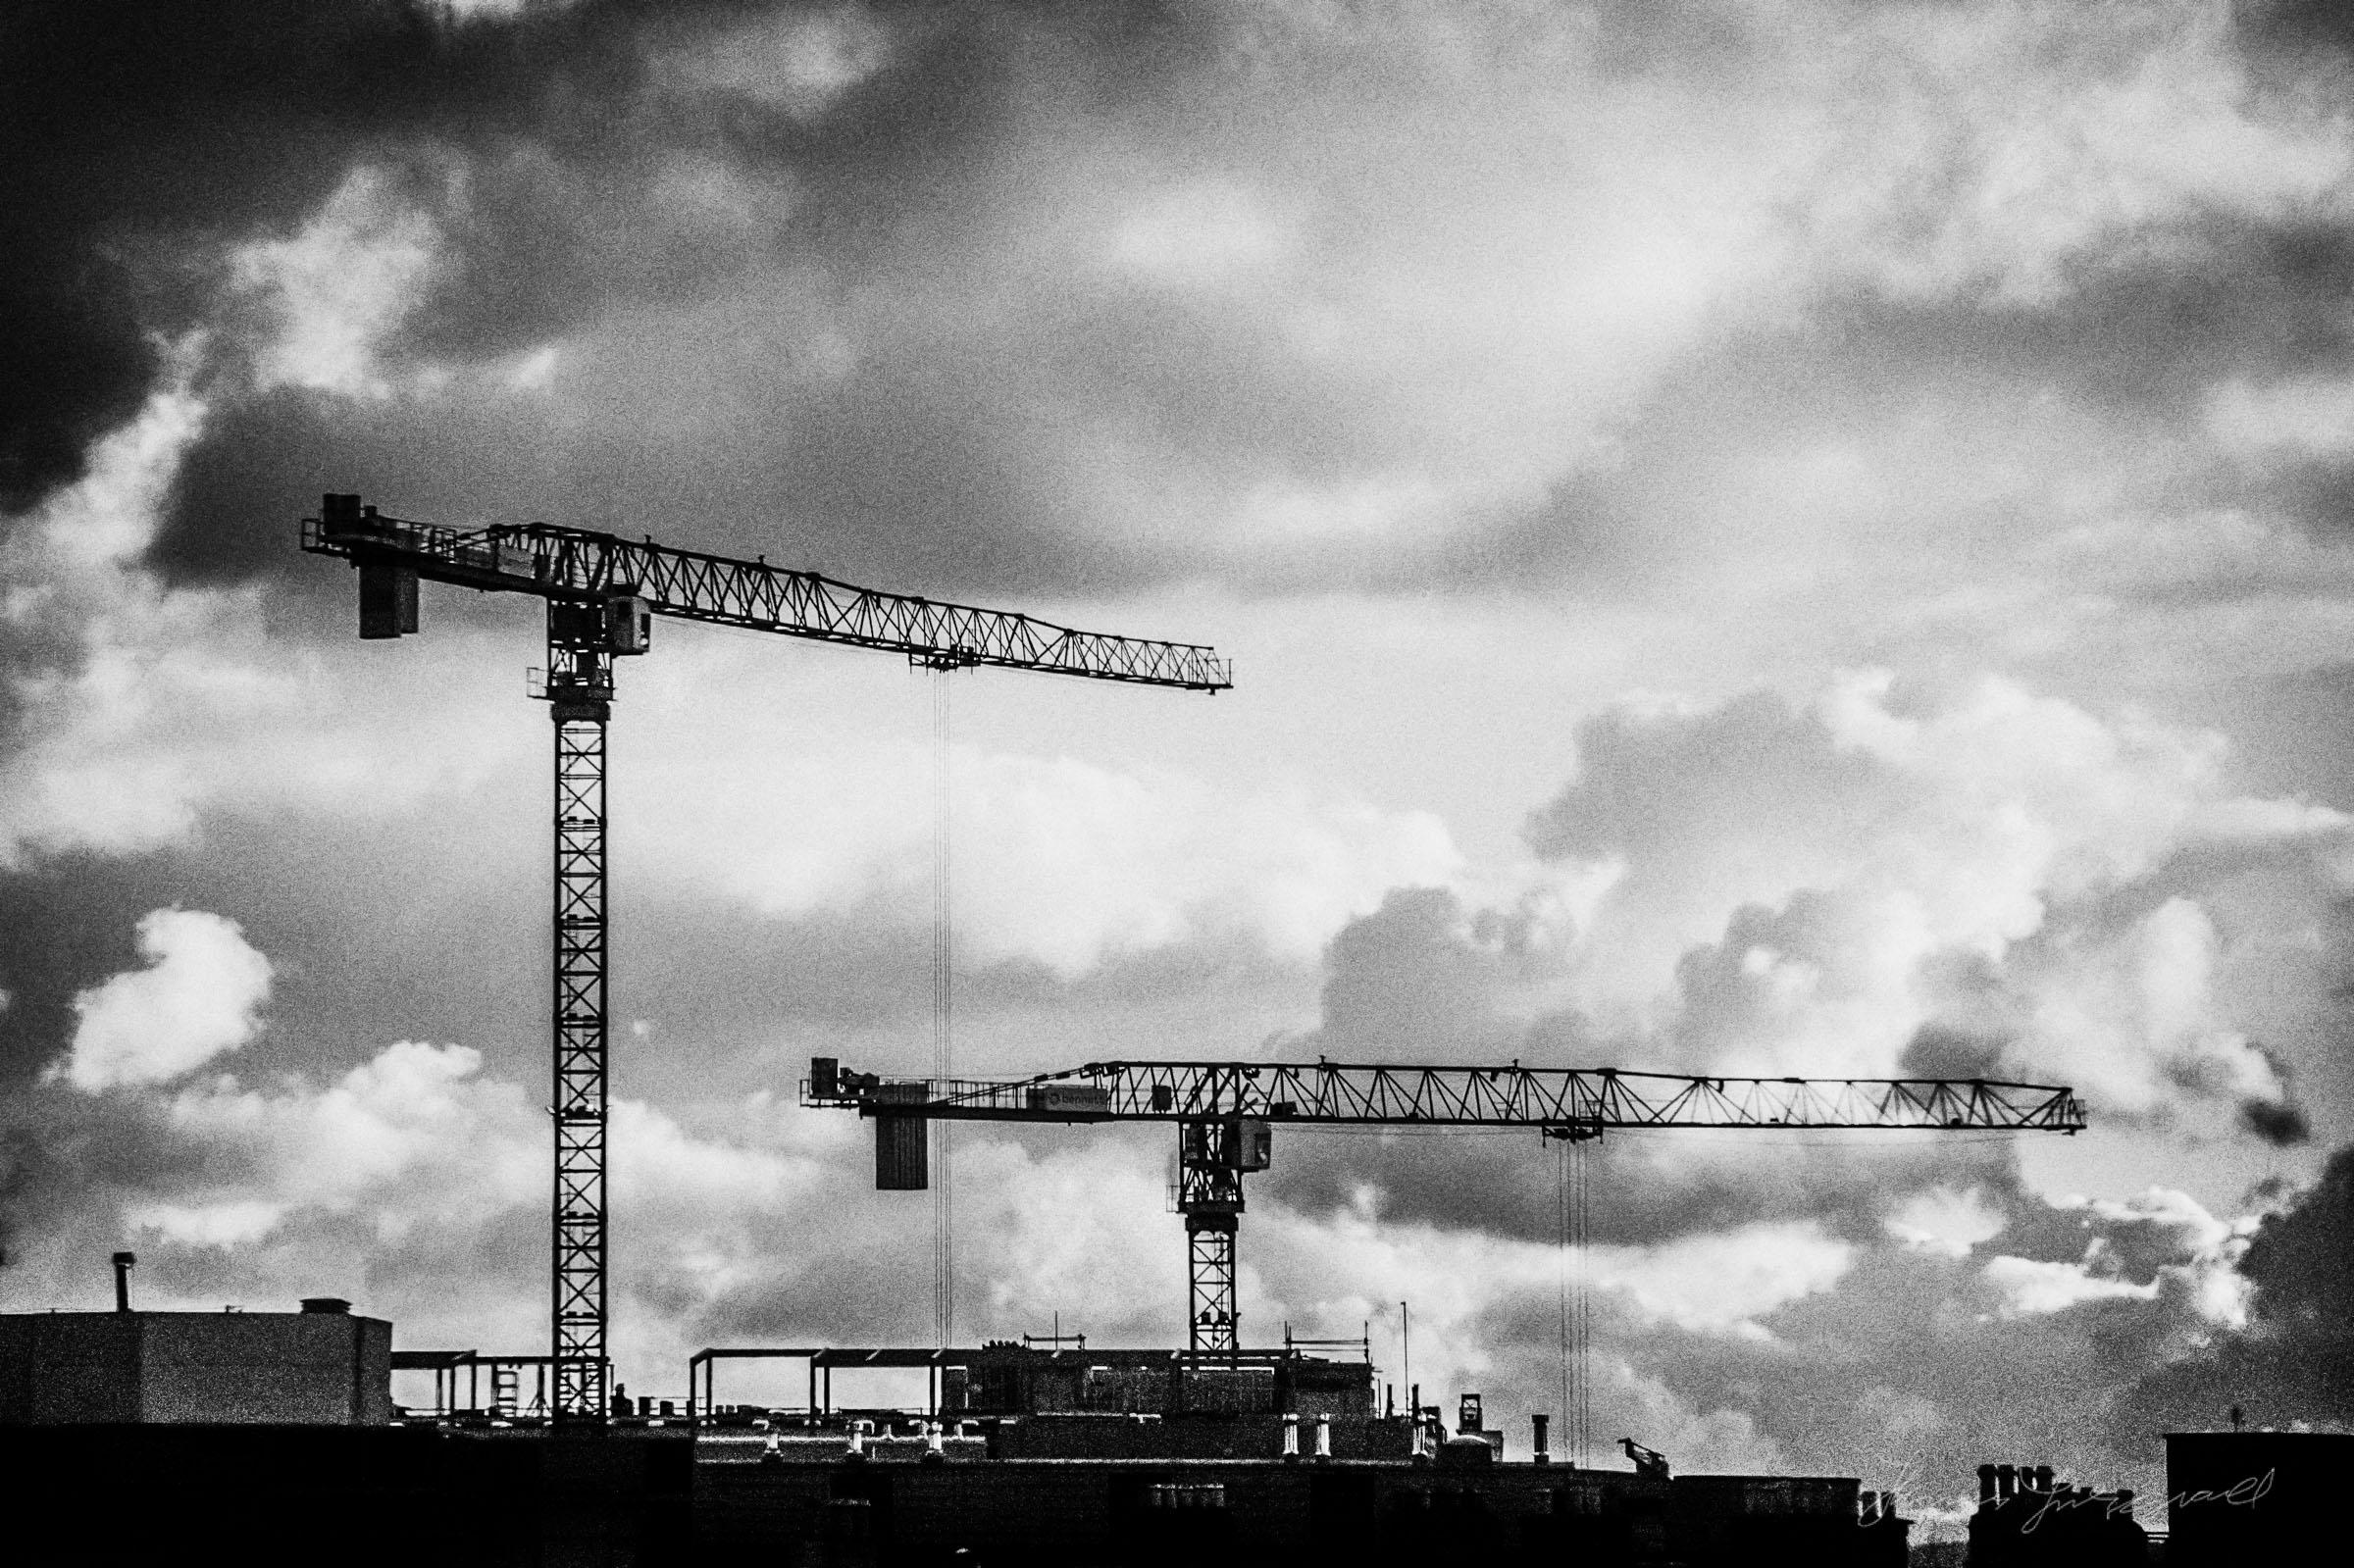 Streets-of-Dublin-Photo-11.jpg